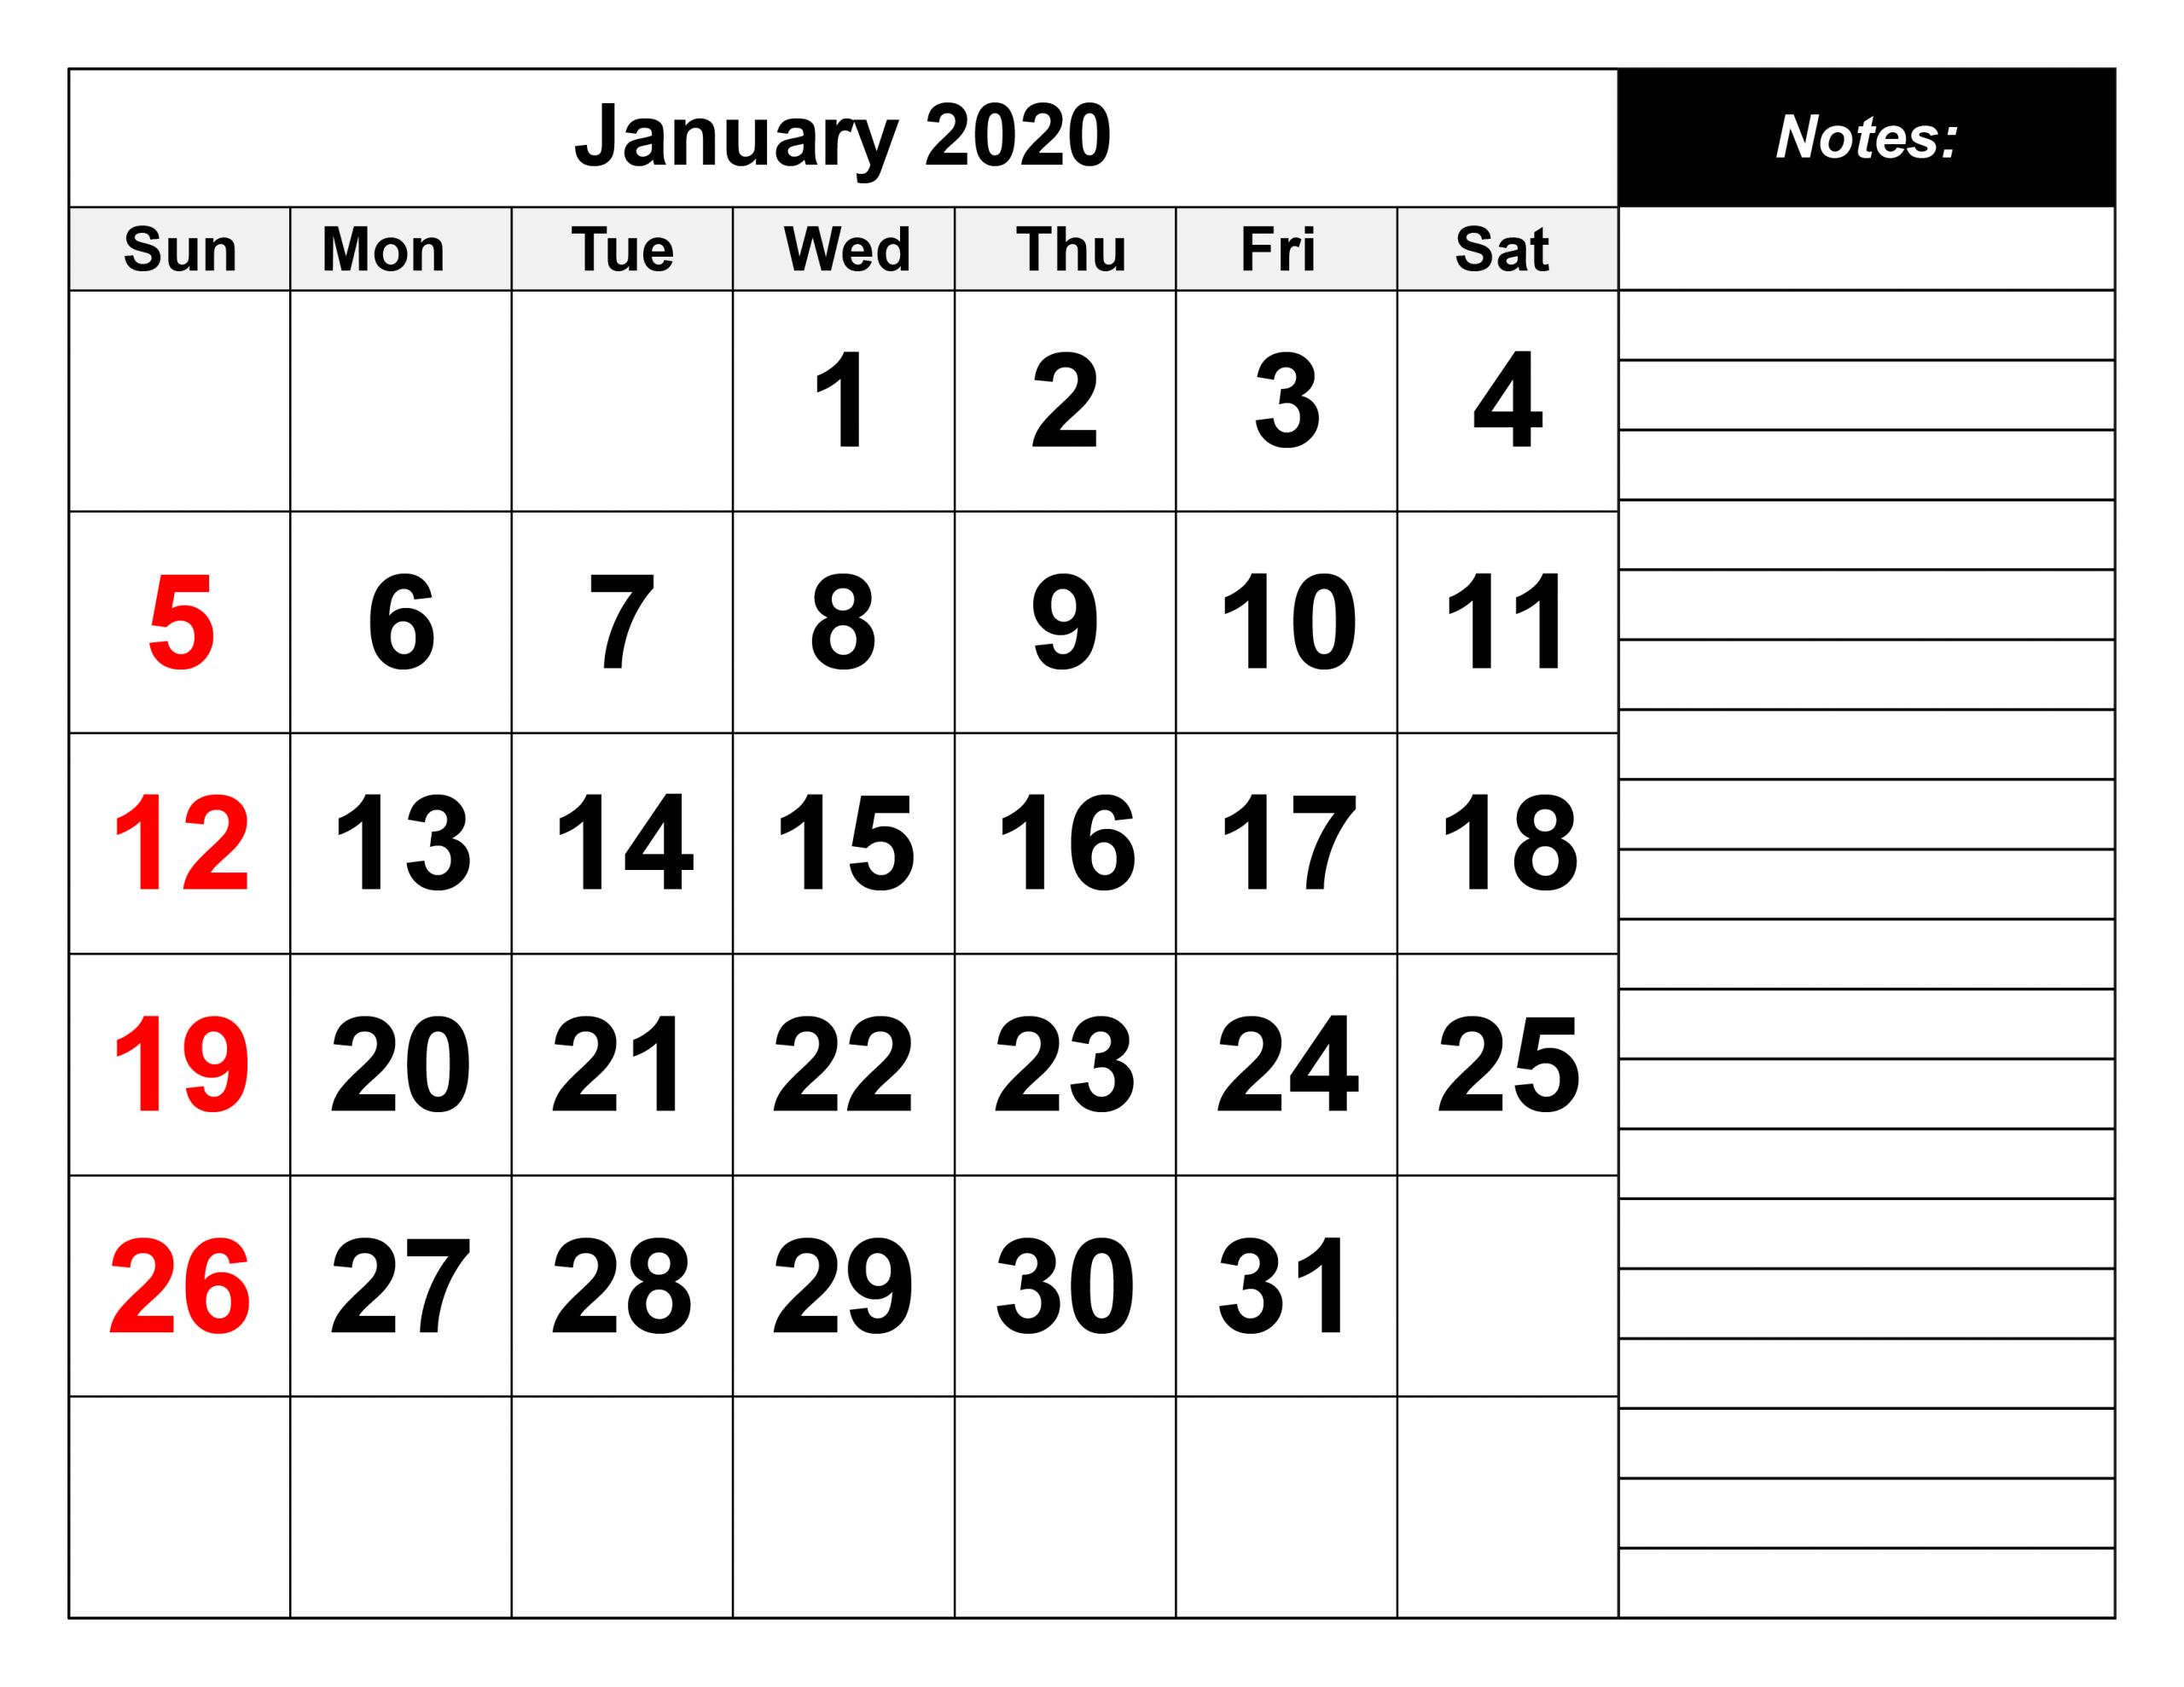 January 2020 Calendar Of Public Holidays | Office Holidays